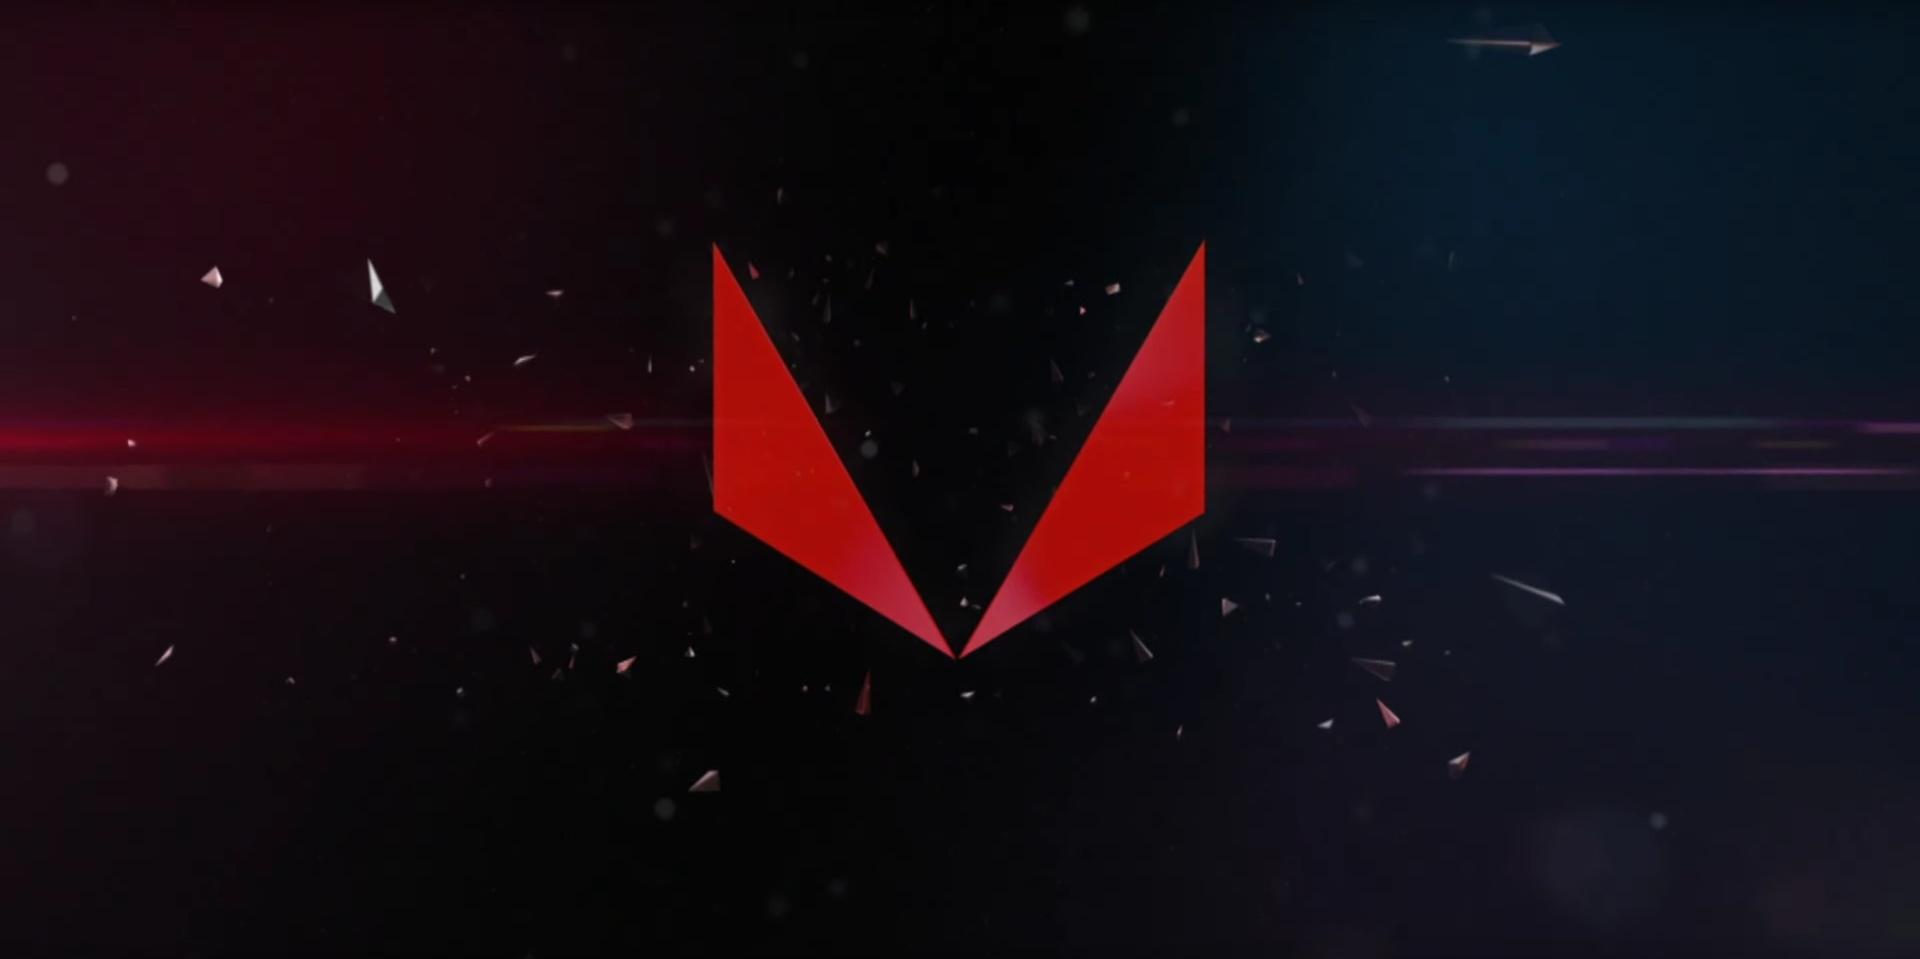 Скоро графические ускорители AMD Radeon RX Vega уйдут на покой